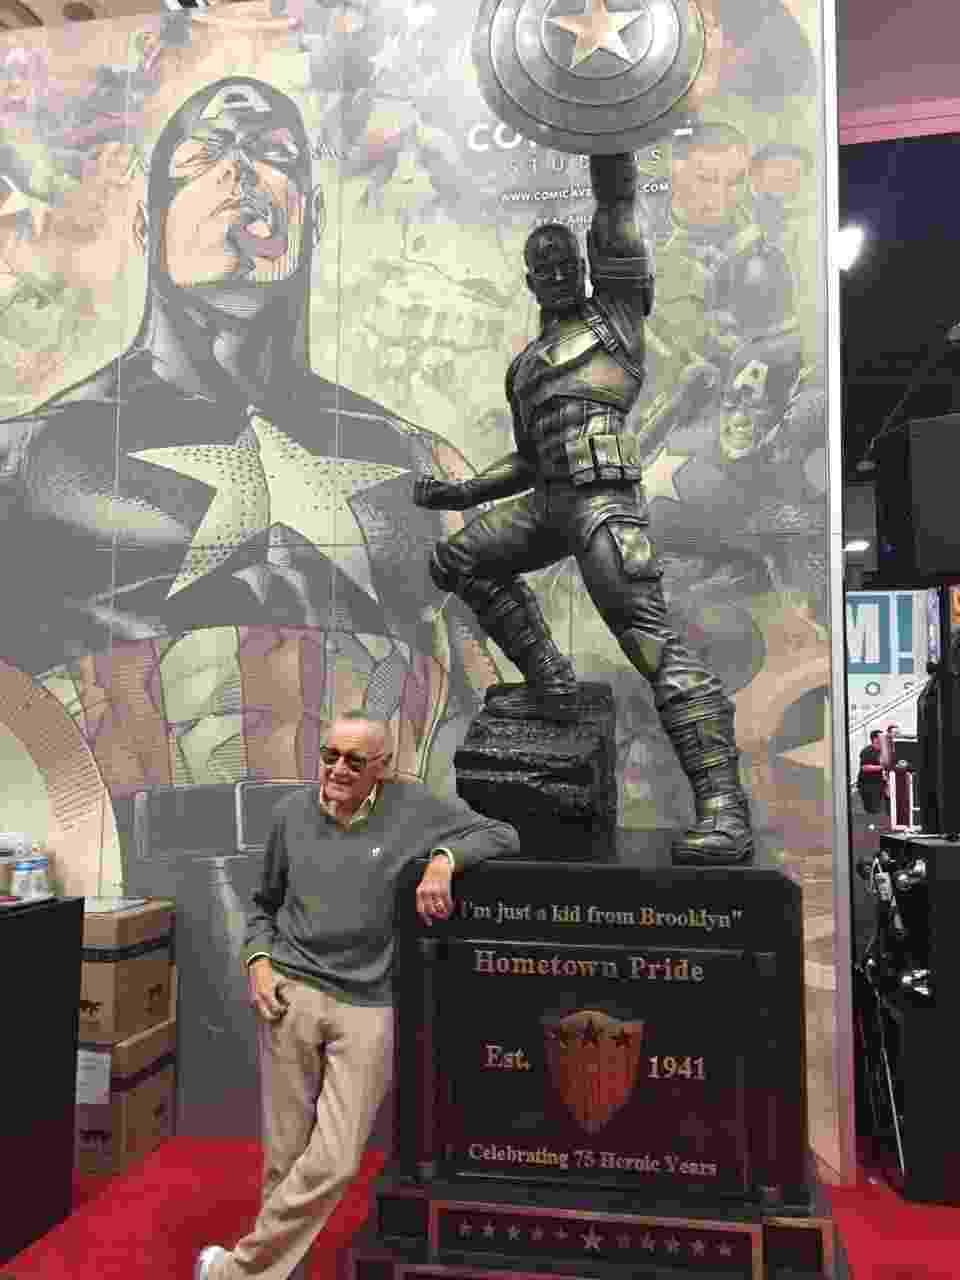 24.jul.2016 - Stan Lee passeia pelo estande da Marvel durante a San Diego Comic-Con 2016 - Felipe Branco Cruz/UOL